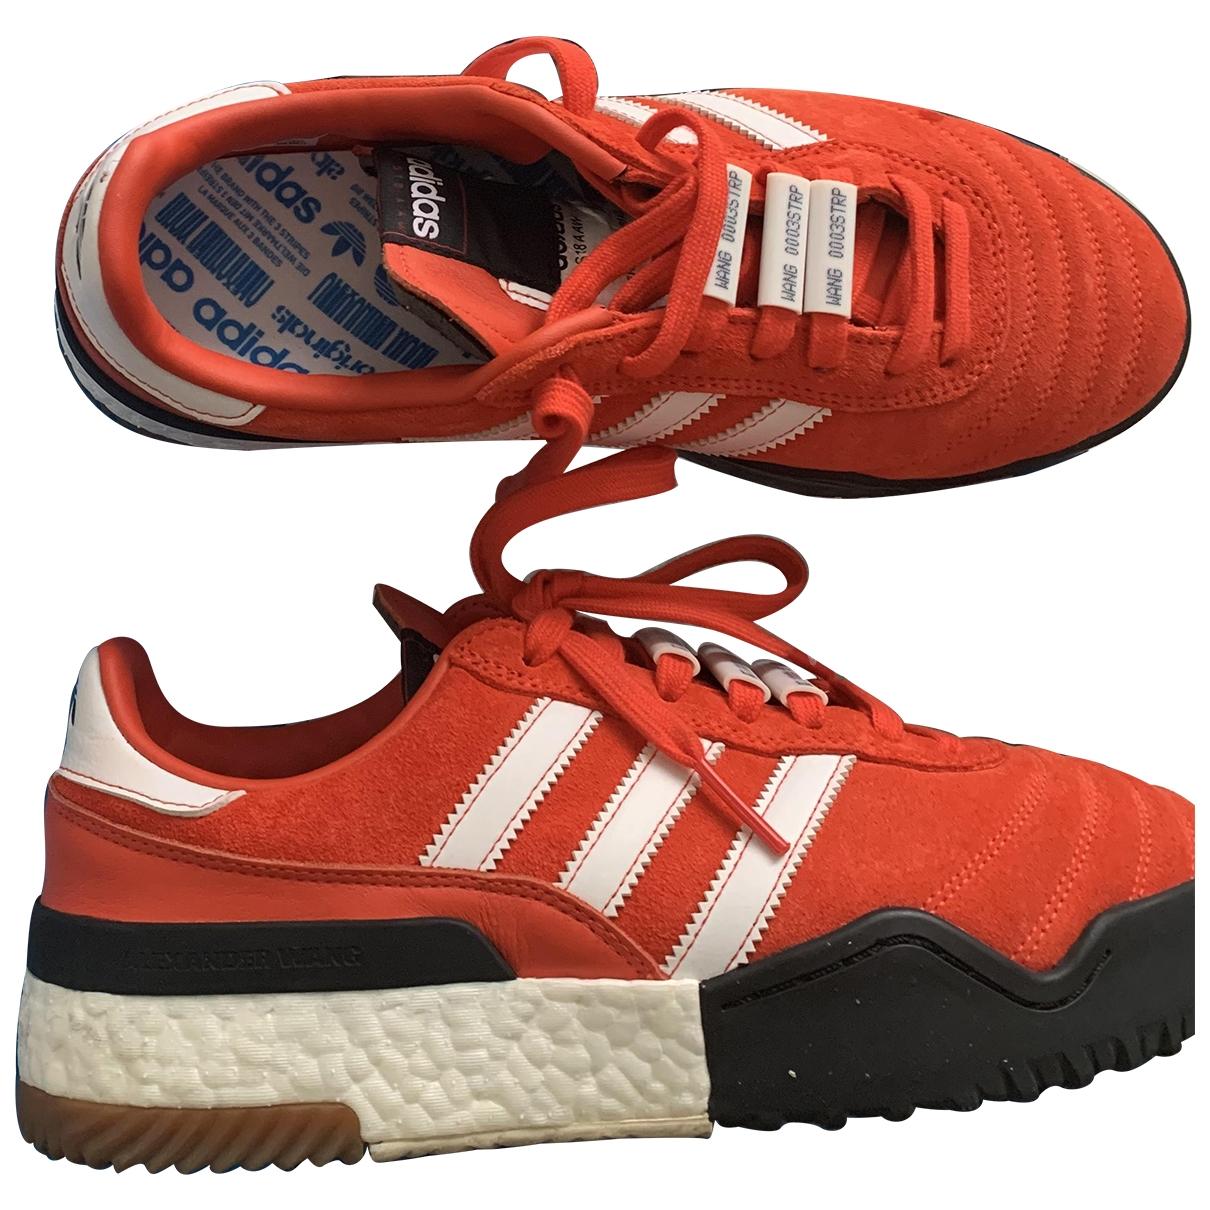 Adidas Originals X Alexander Wang \N Red Suede Trainers for Men 40.5 EU